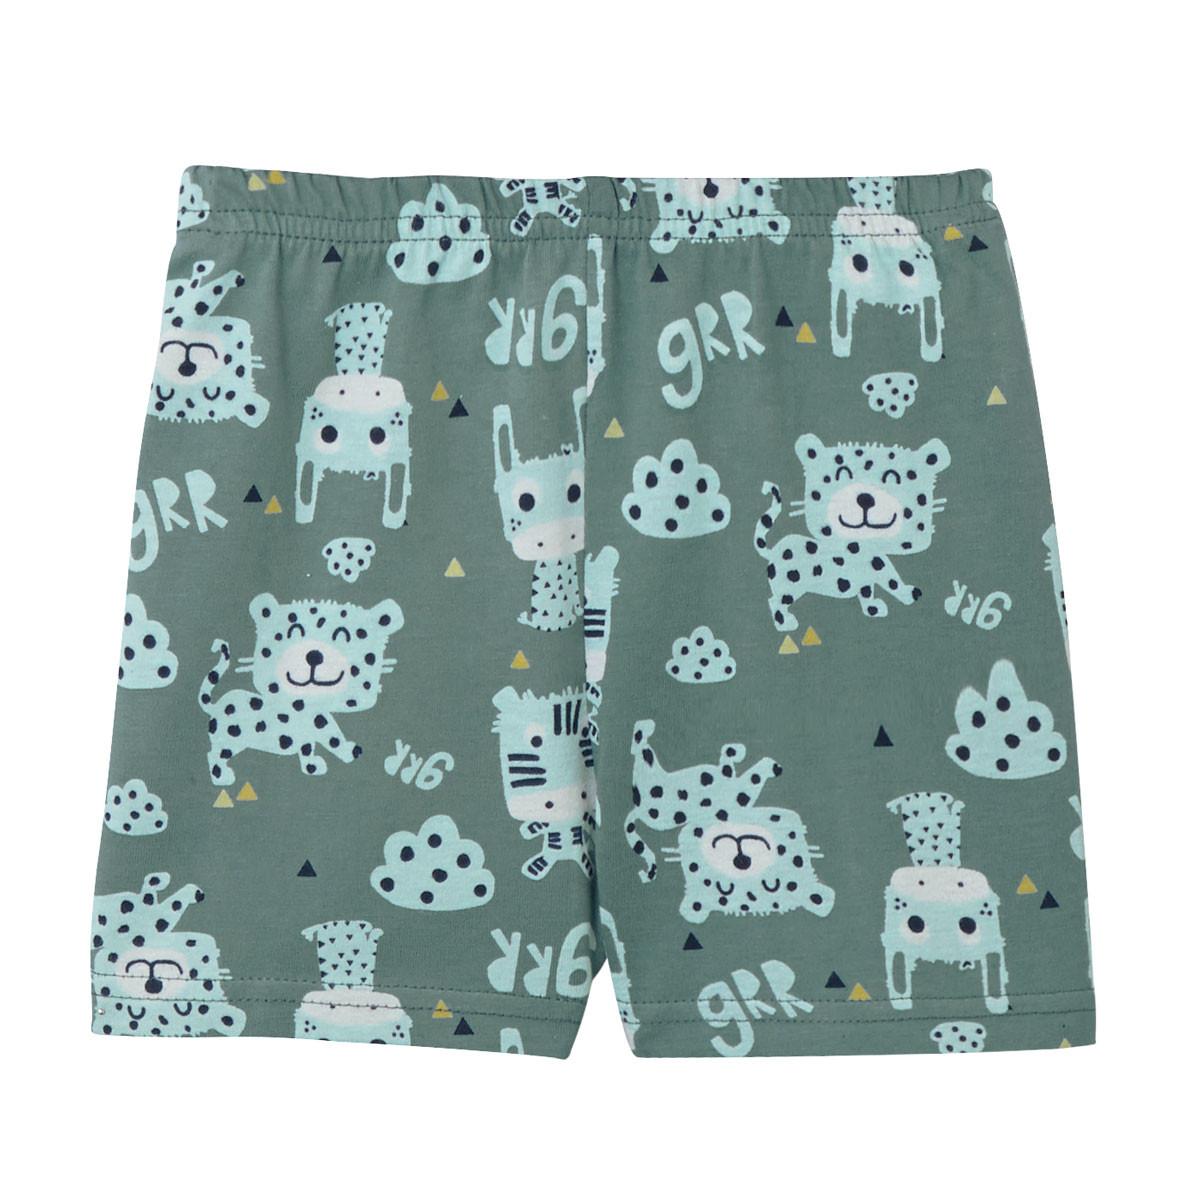 c18675d0f77bc Pyjama manches courtes garçon Jumbe - PETIT BEGUIN